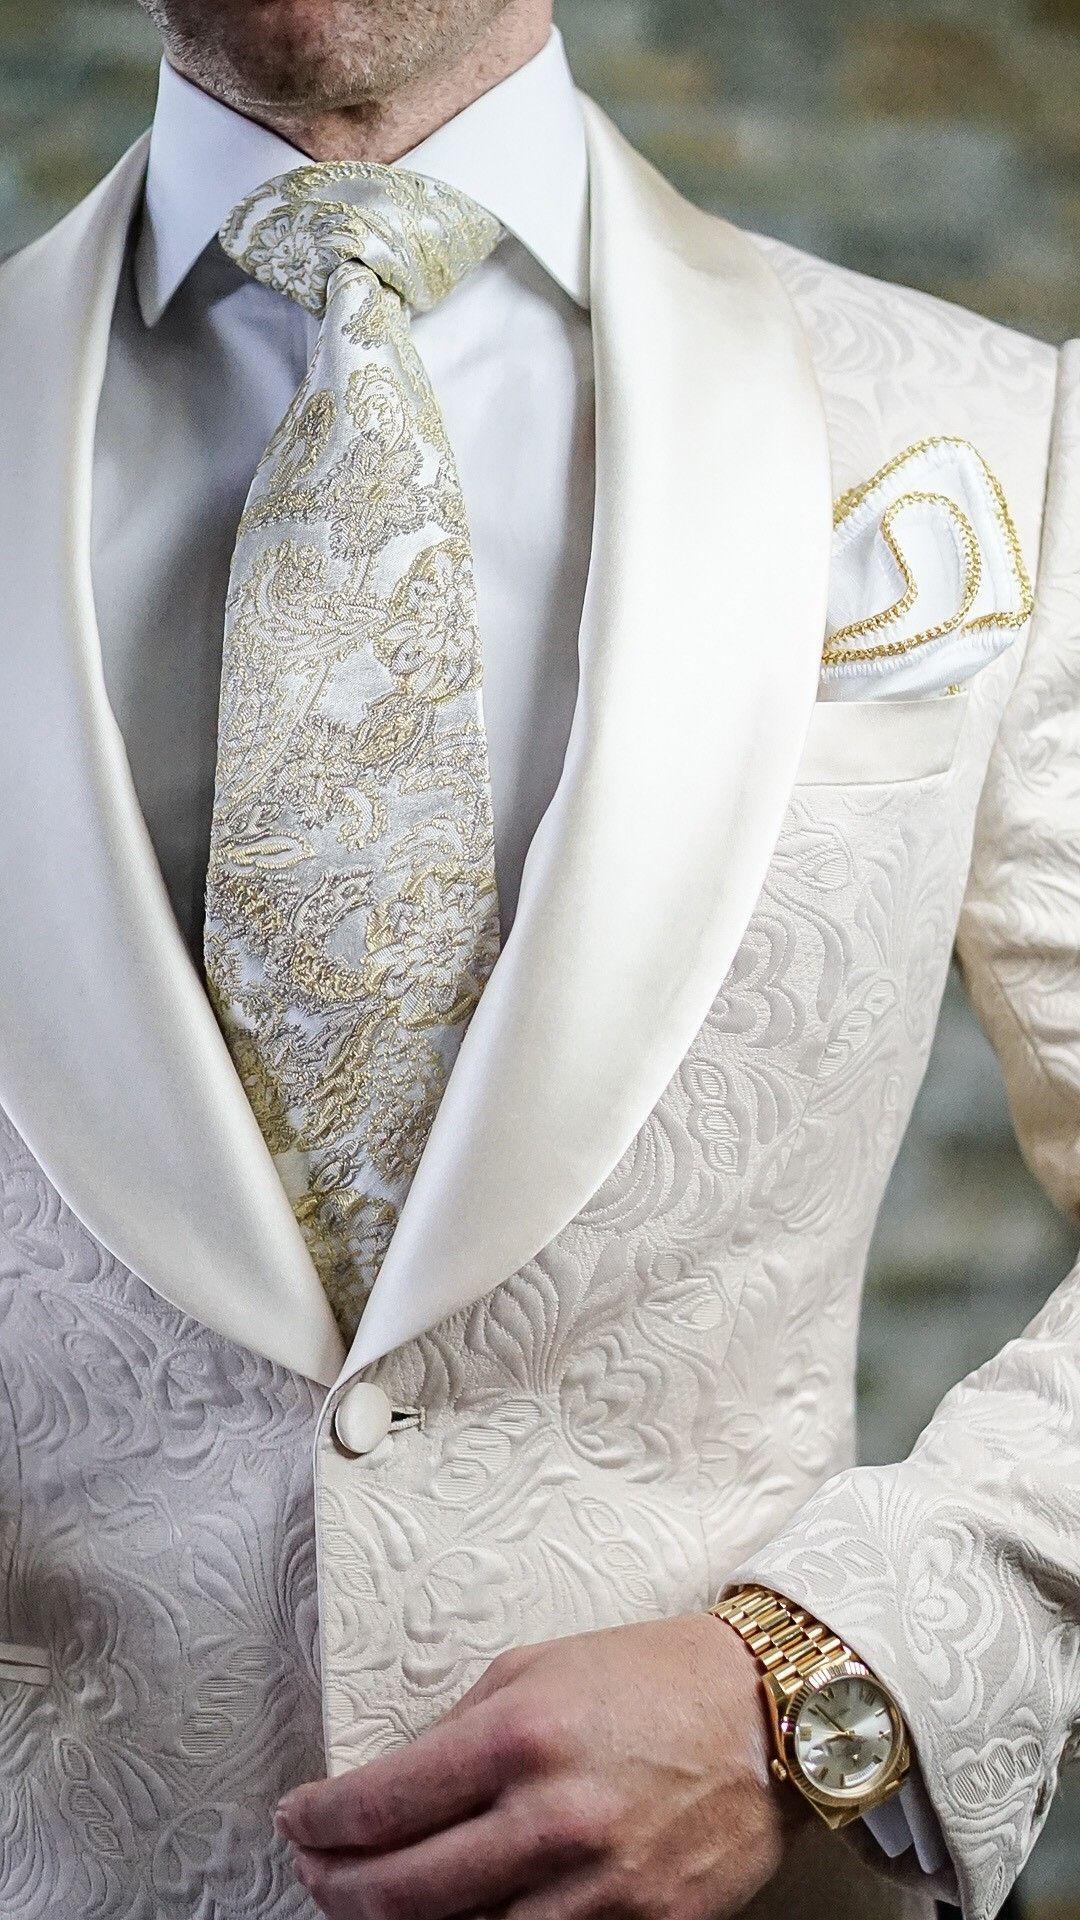 S by Sebastian Ivory Paisley Dinner Jacket Wedding suits